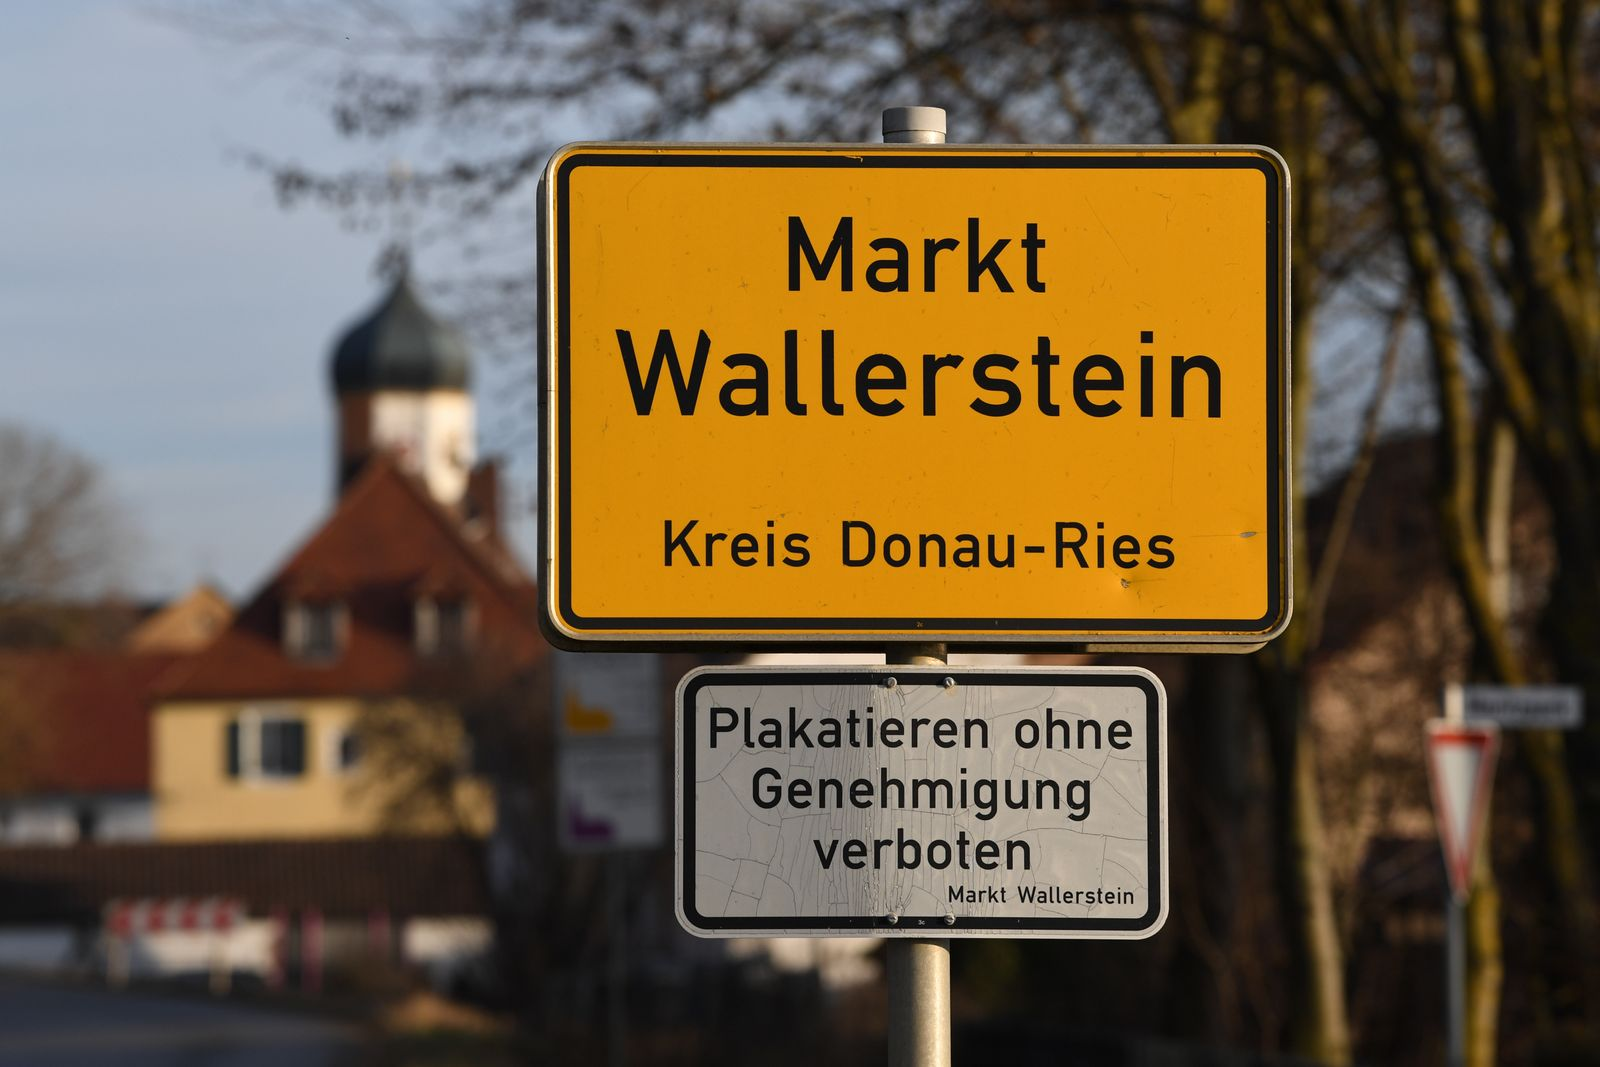 The CSU Wrestles With Religious Prejudice In Wallerstein